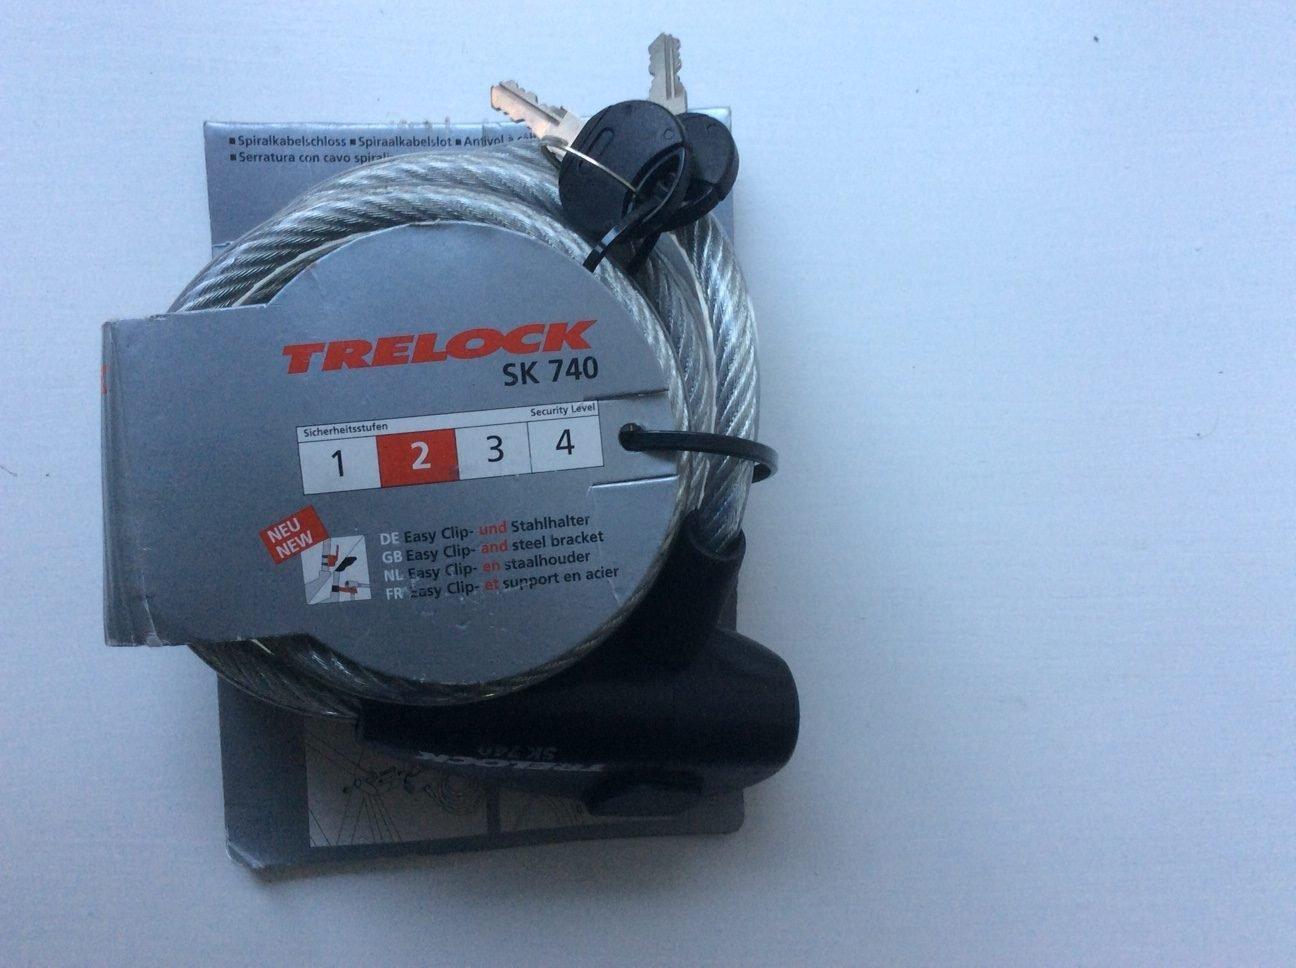 Trelock 1.8m cable lock